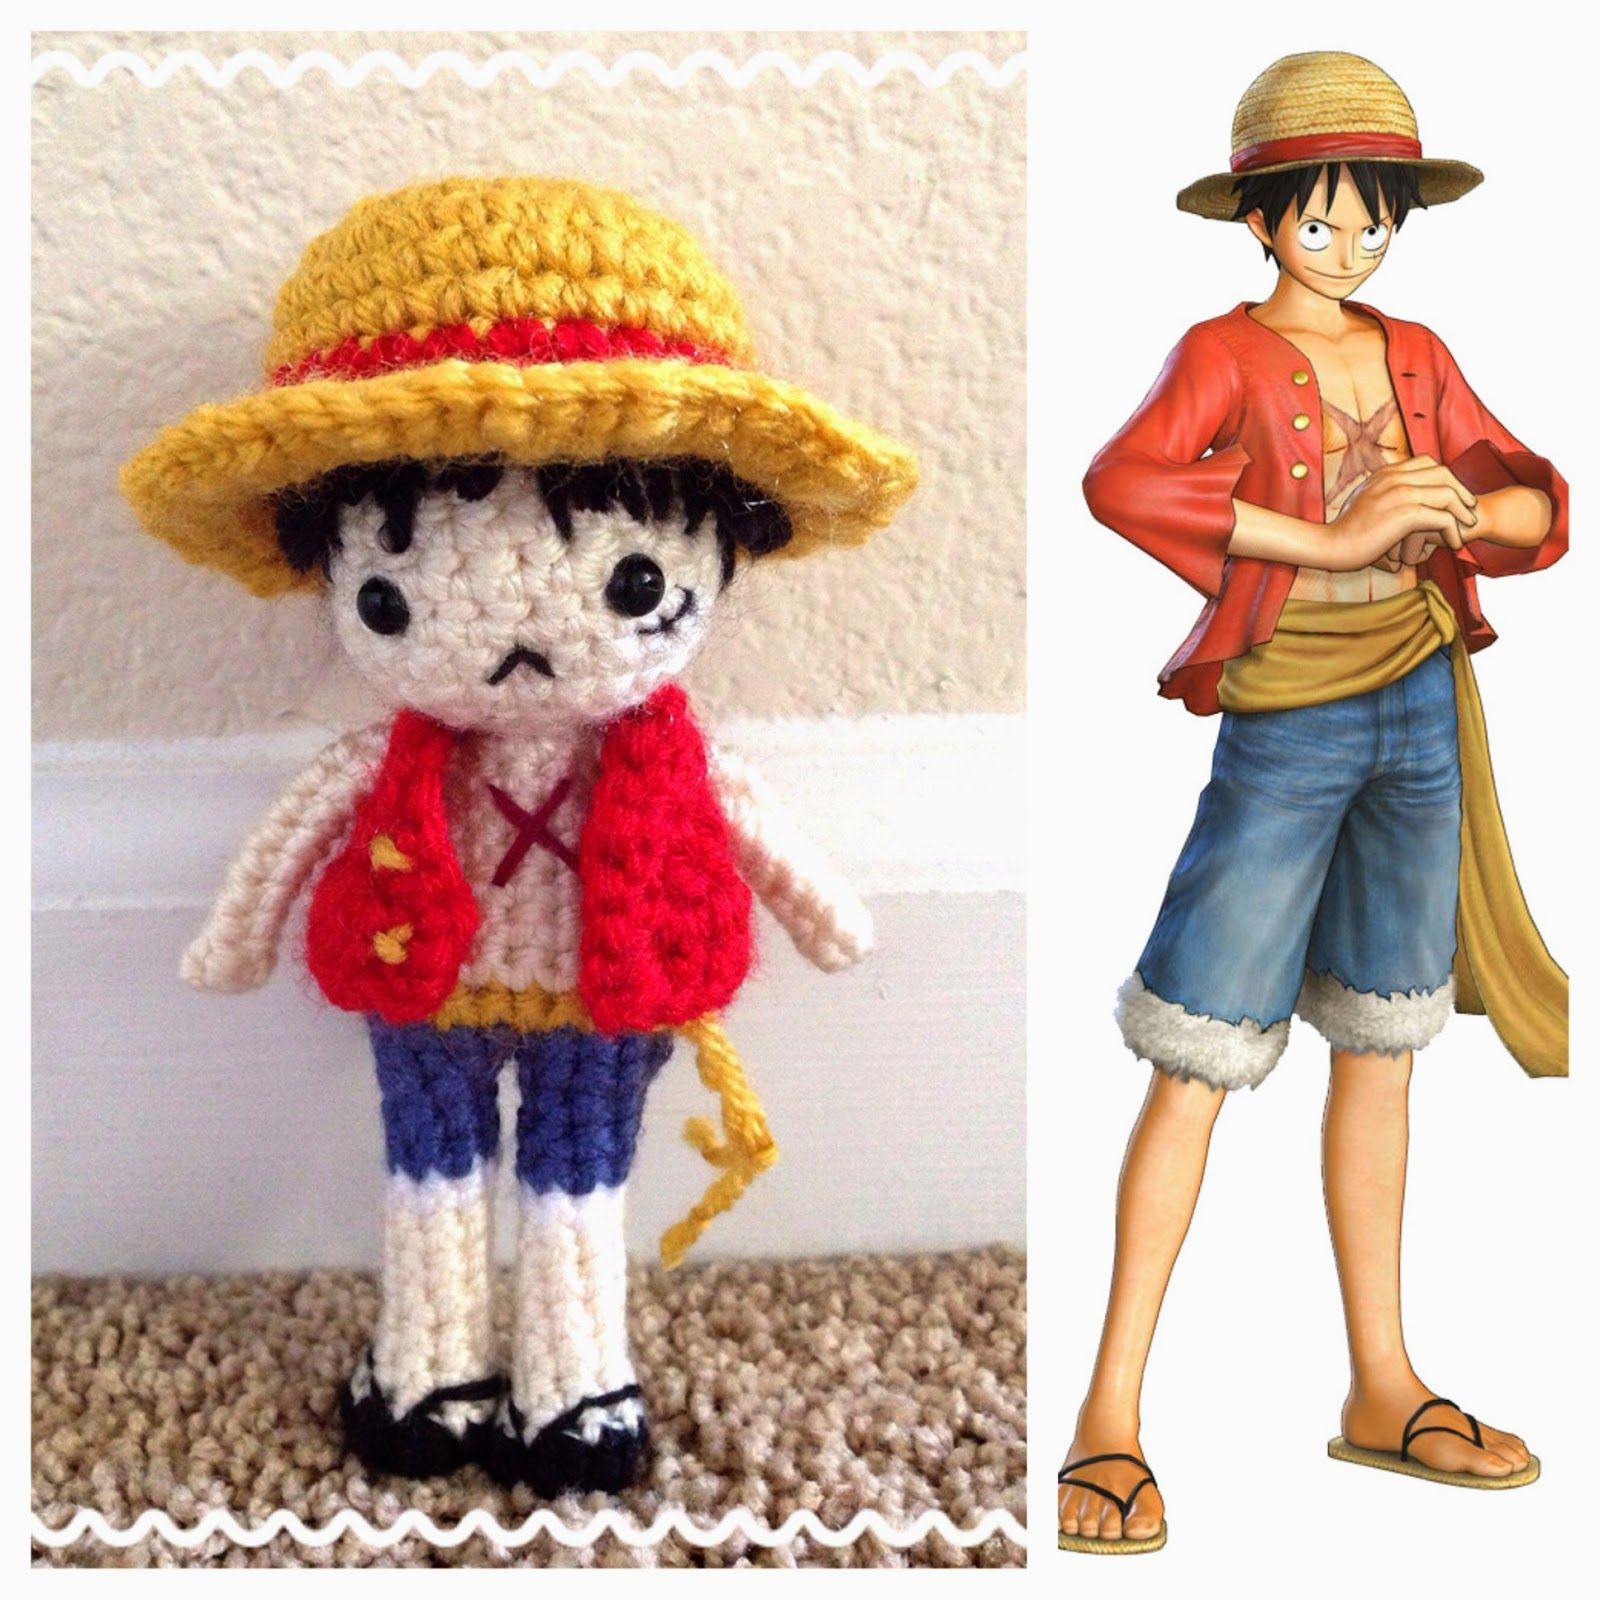 Monkey D Luffy One Piece Amigurumi Crochet Doll Japanese Anime Manga Craft Pattern Diy Straw Hat Yarn Japanese Crochet Crochet Amigurumi Crochet